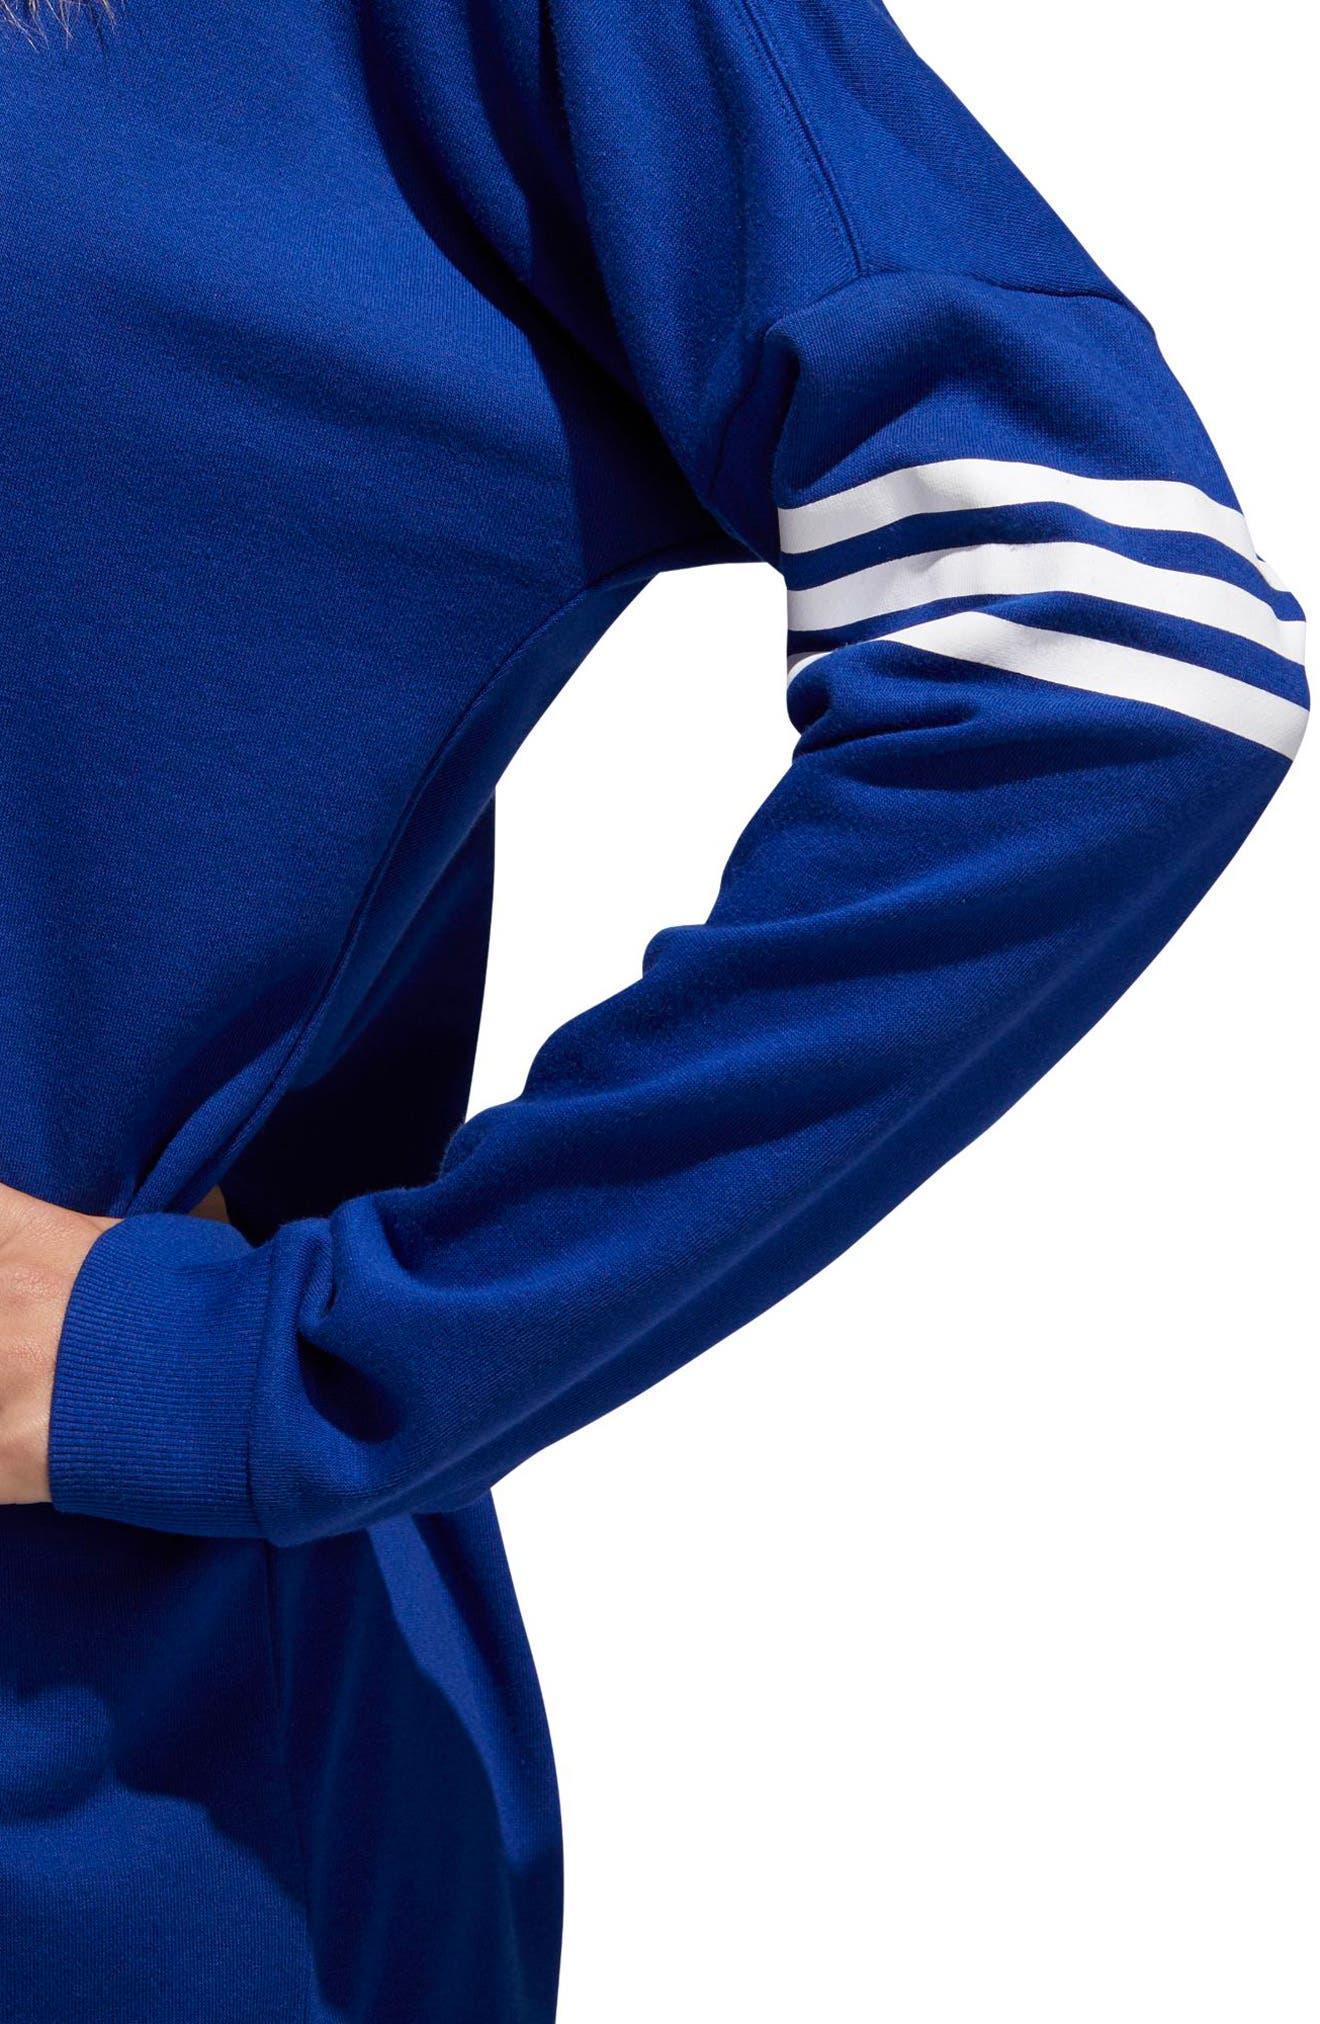 adidas Oversize Crewneck Sweatshirt,                             Alternate thumbnail 8, color,                             MYSTERY INK